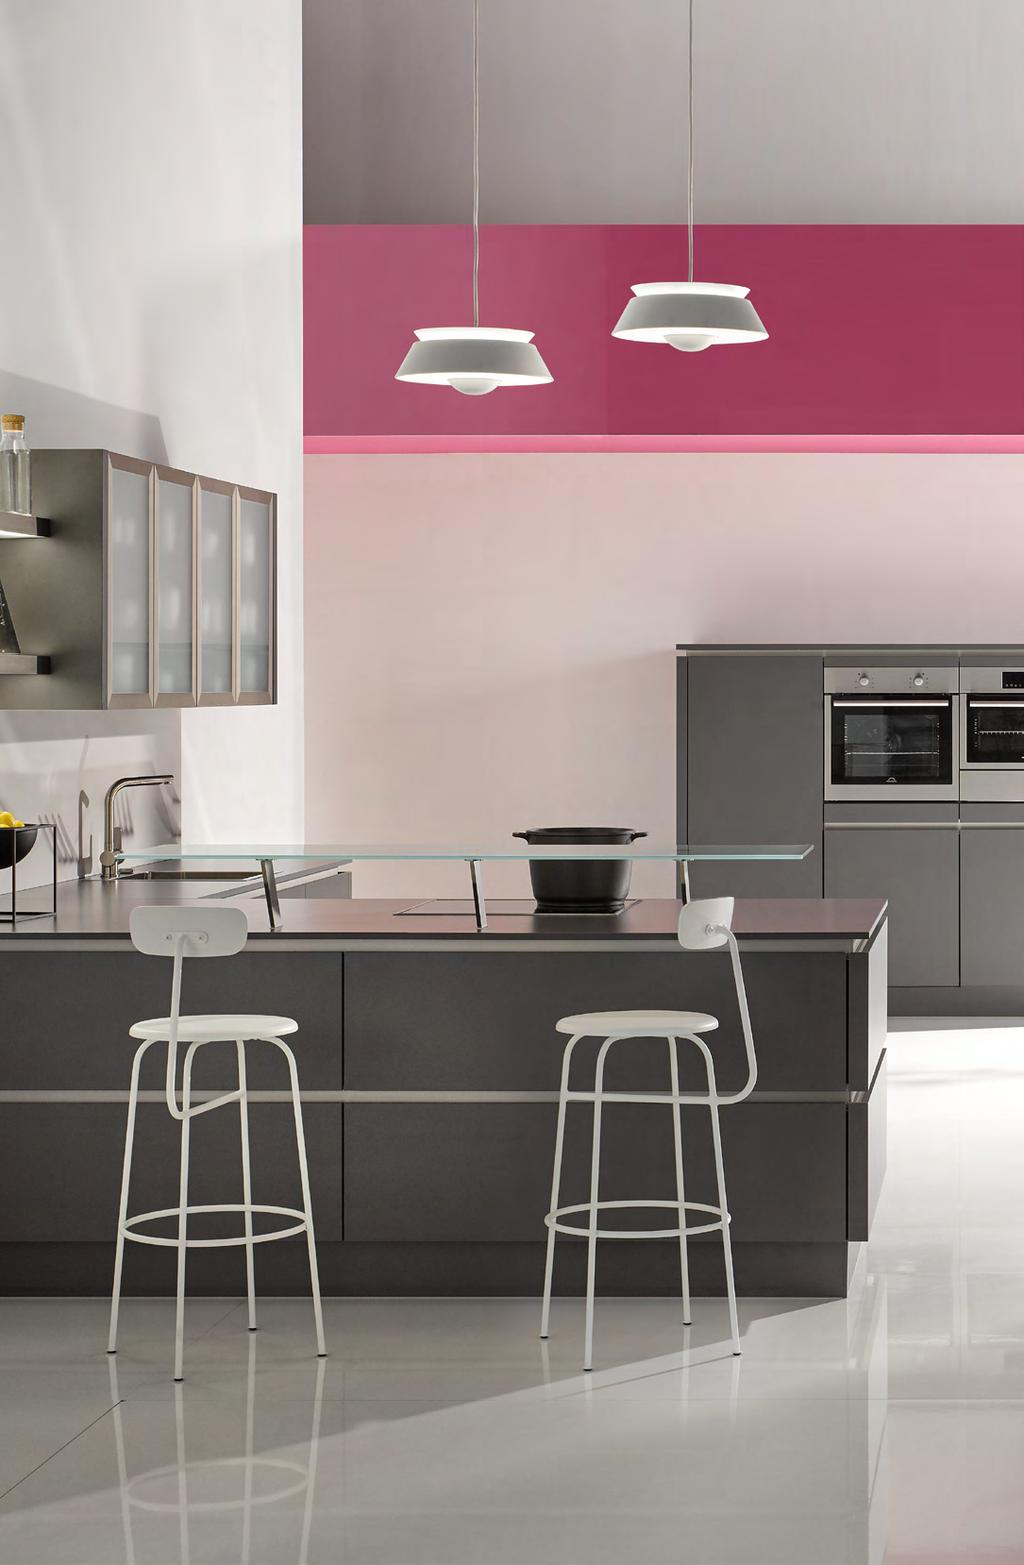 Reling Küche | Reling Küche Edelstahl Klebefolie Küche Edelstahl